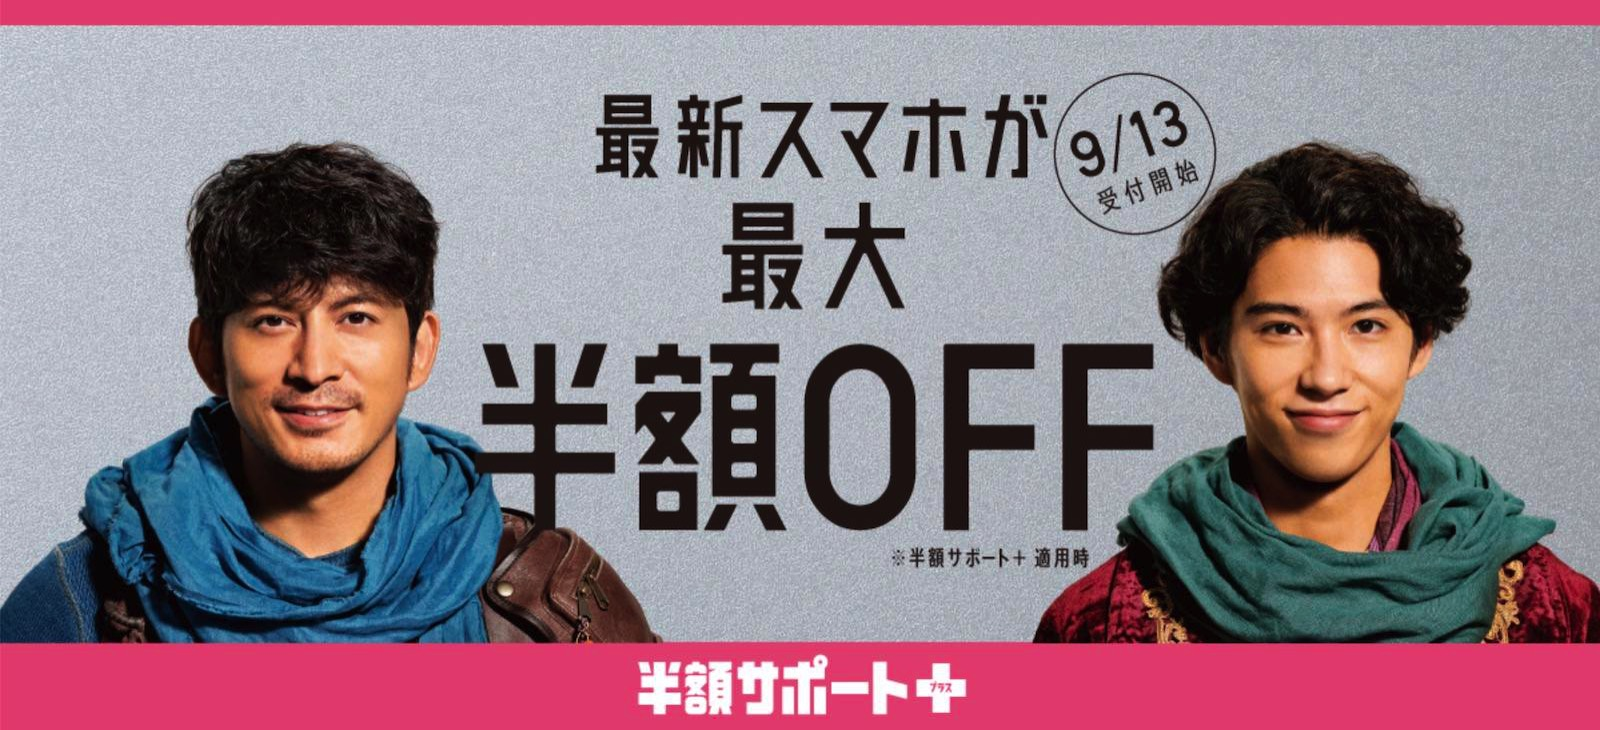 hangaku-saupport-softbank.jpg